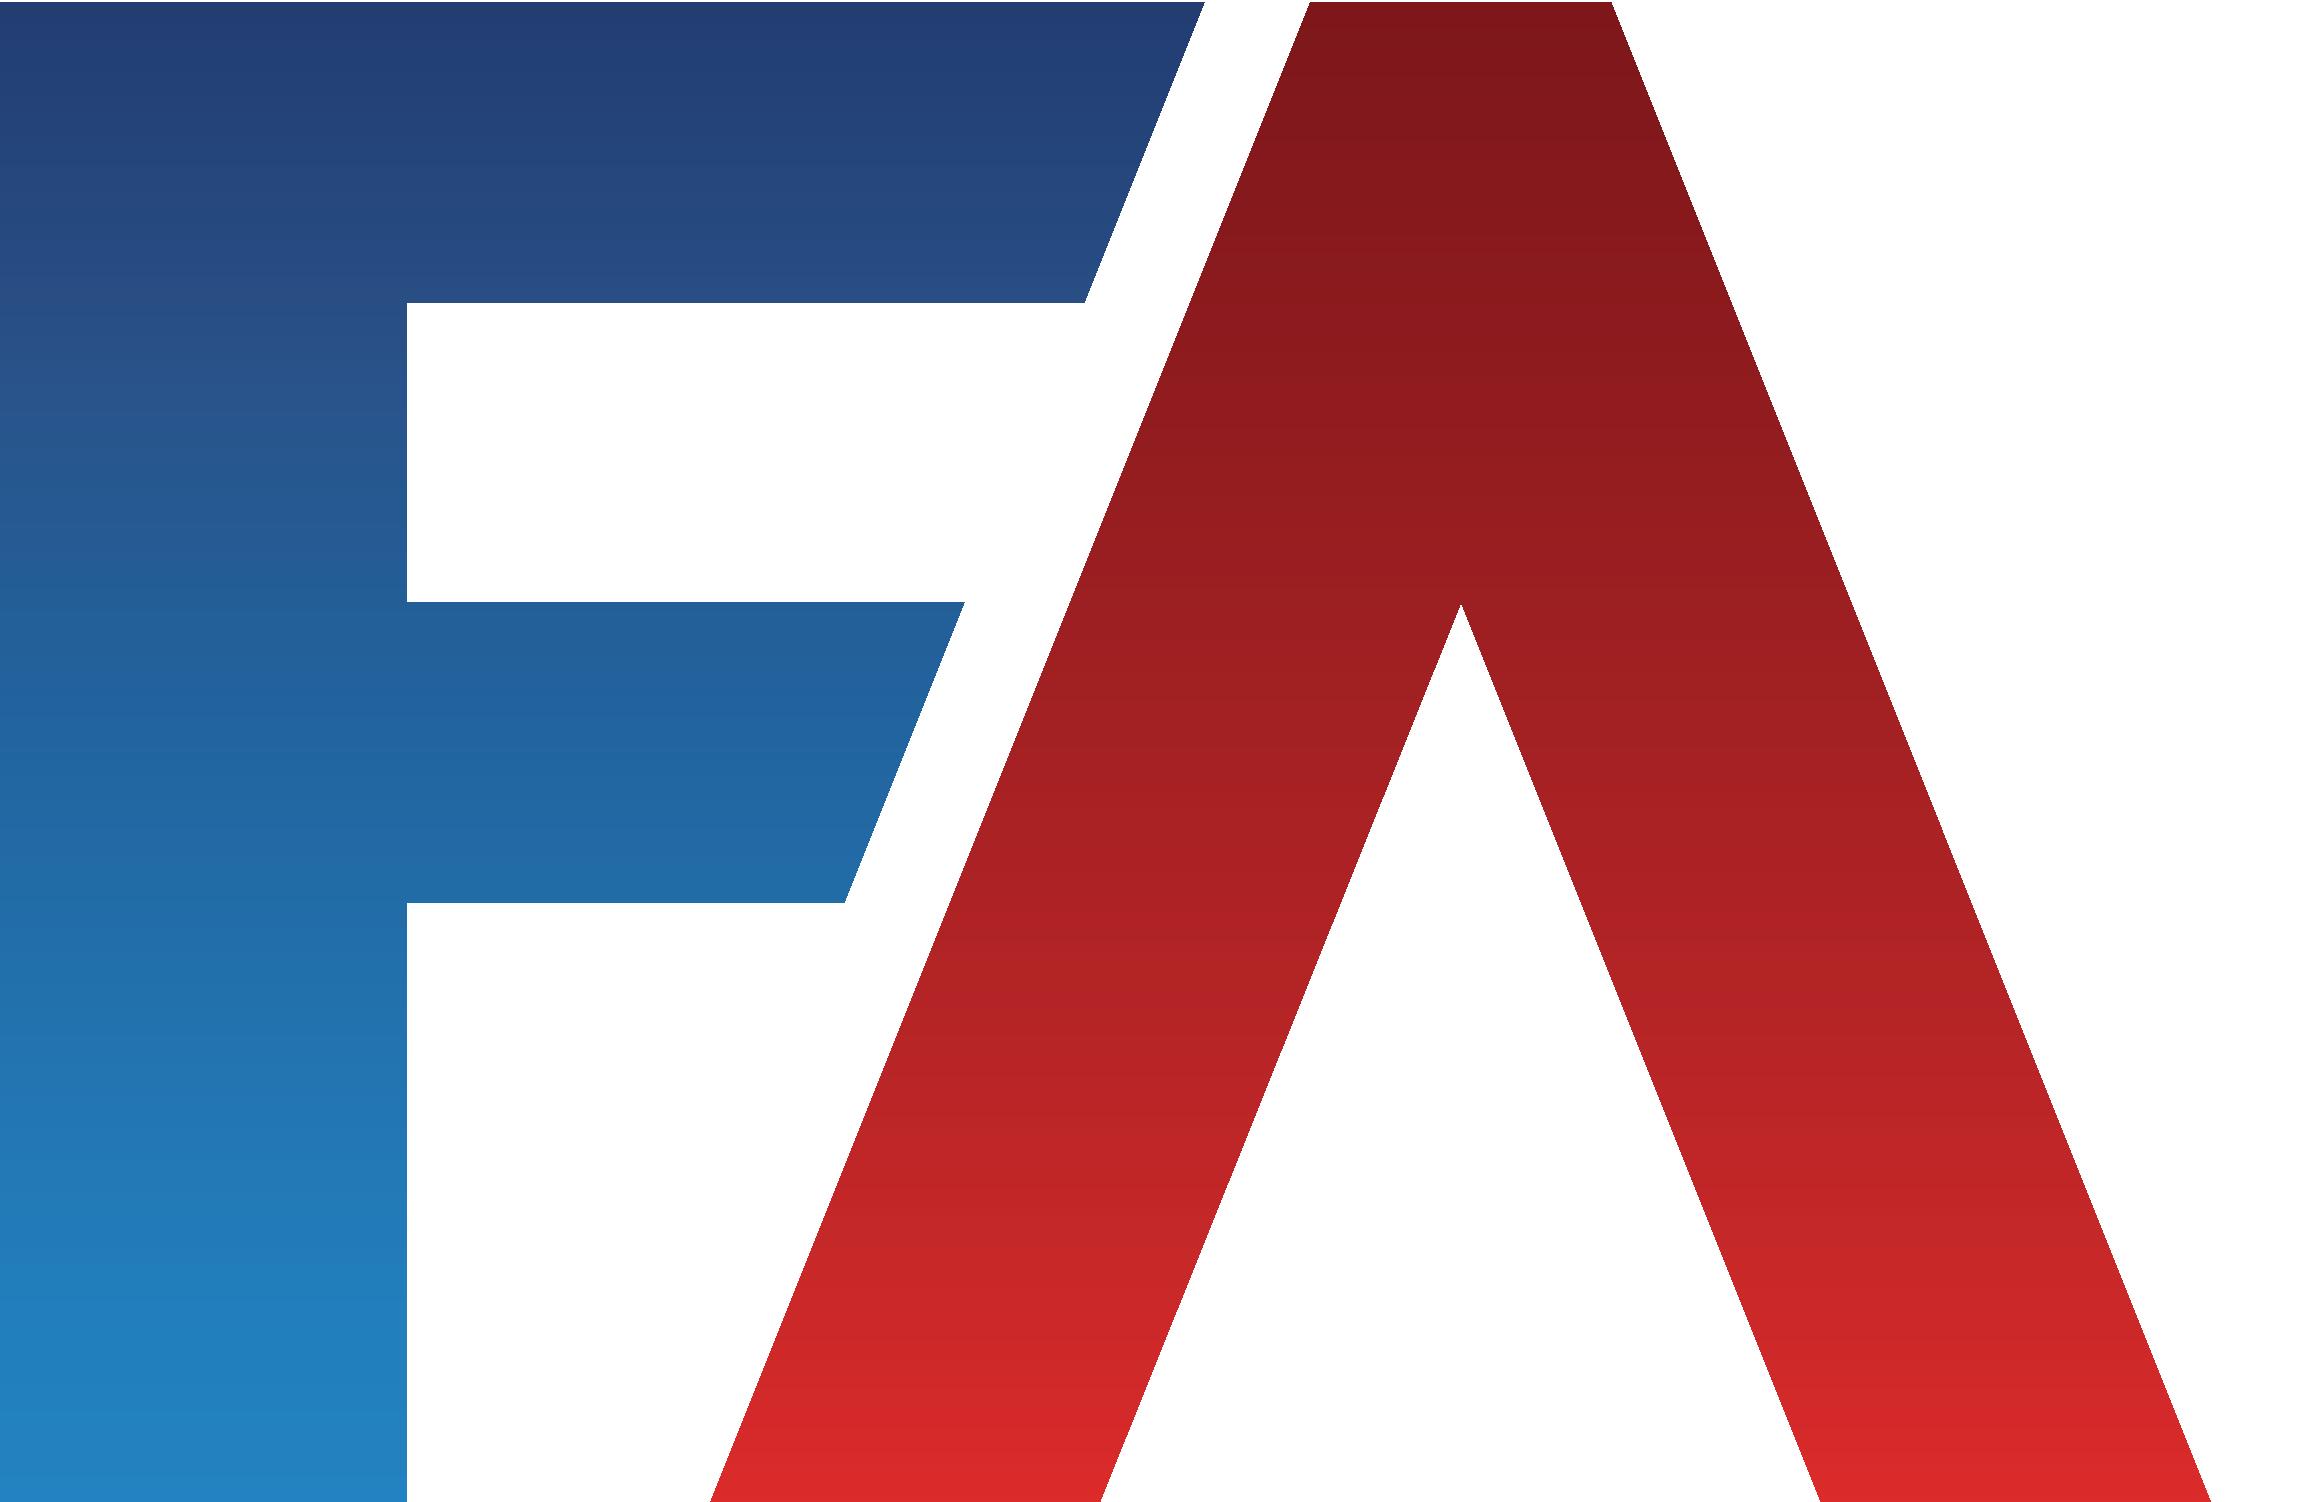 Fantasy Sports Business: Media Missed News in Indiana | FantasyAlarm.com